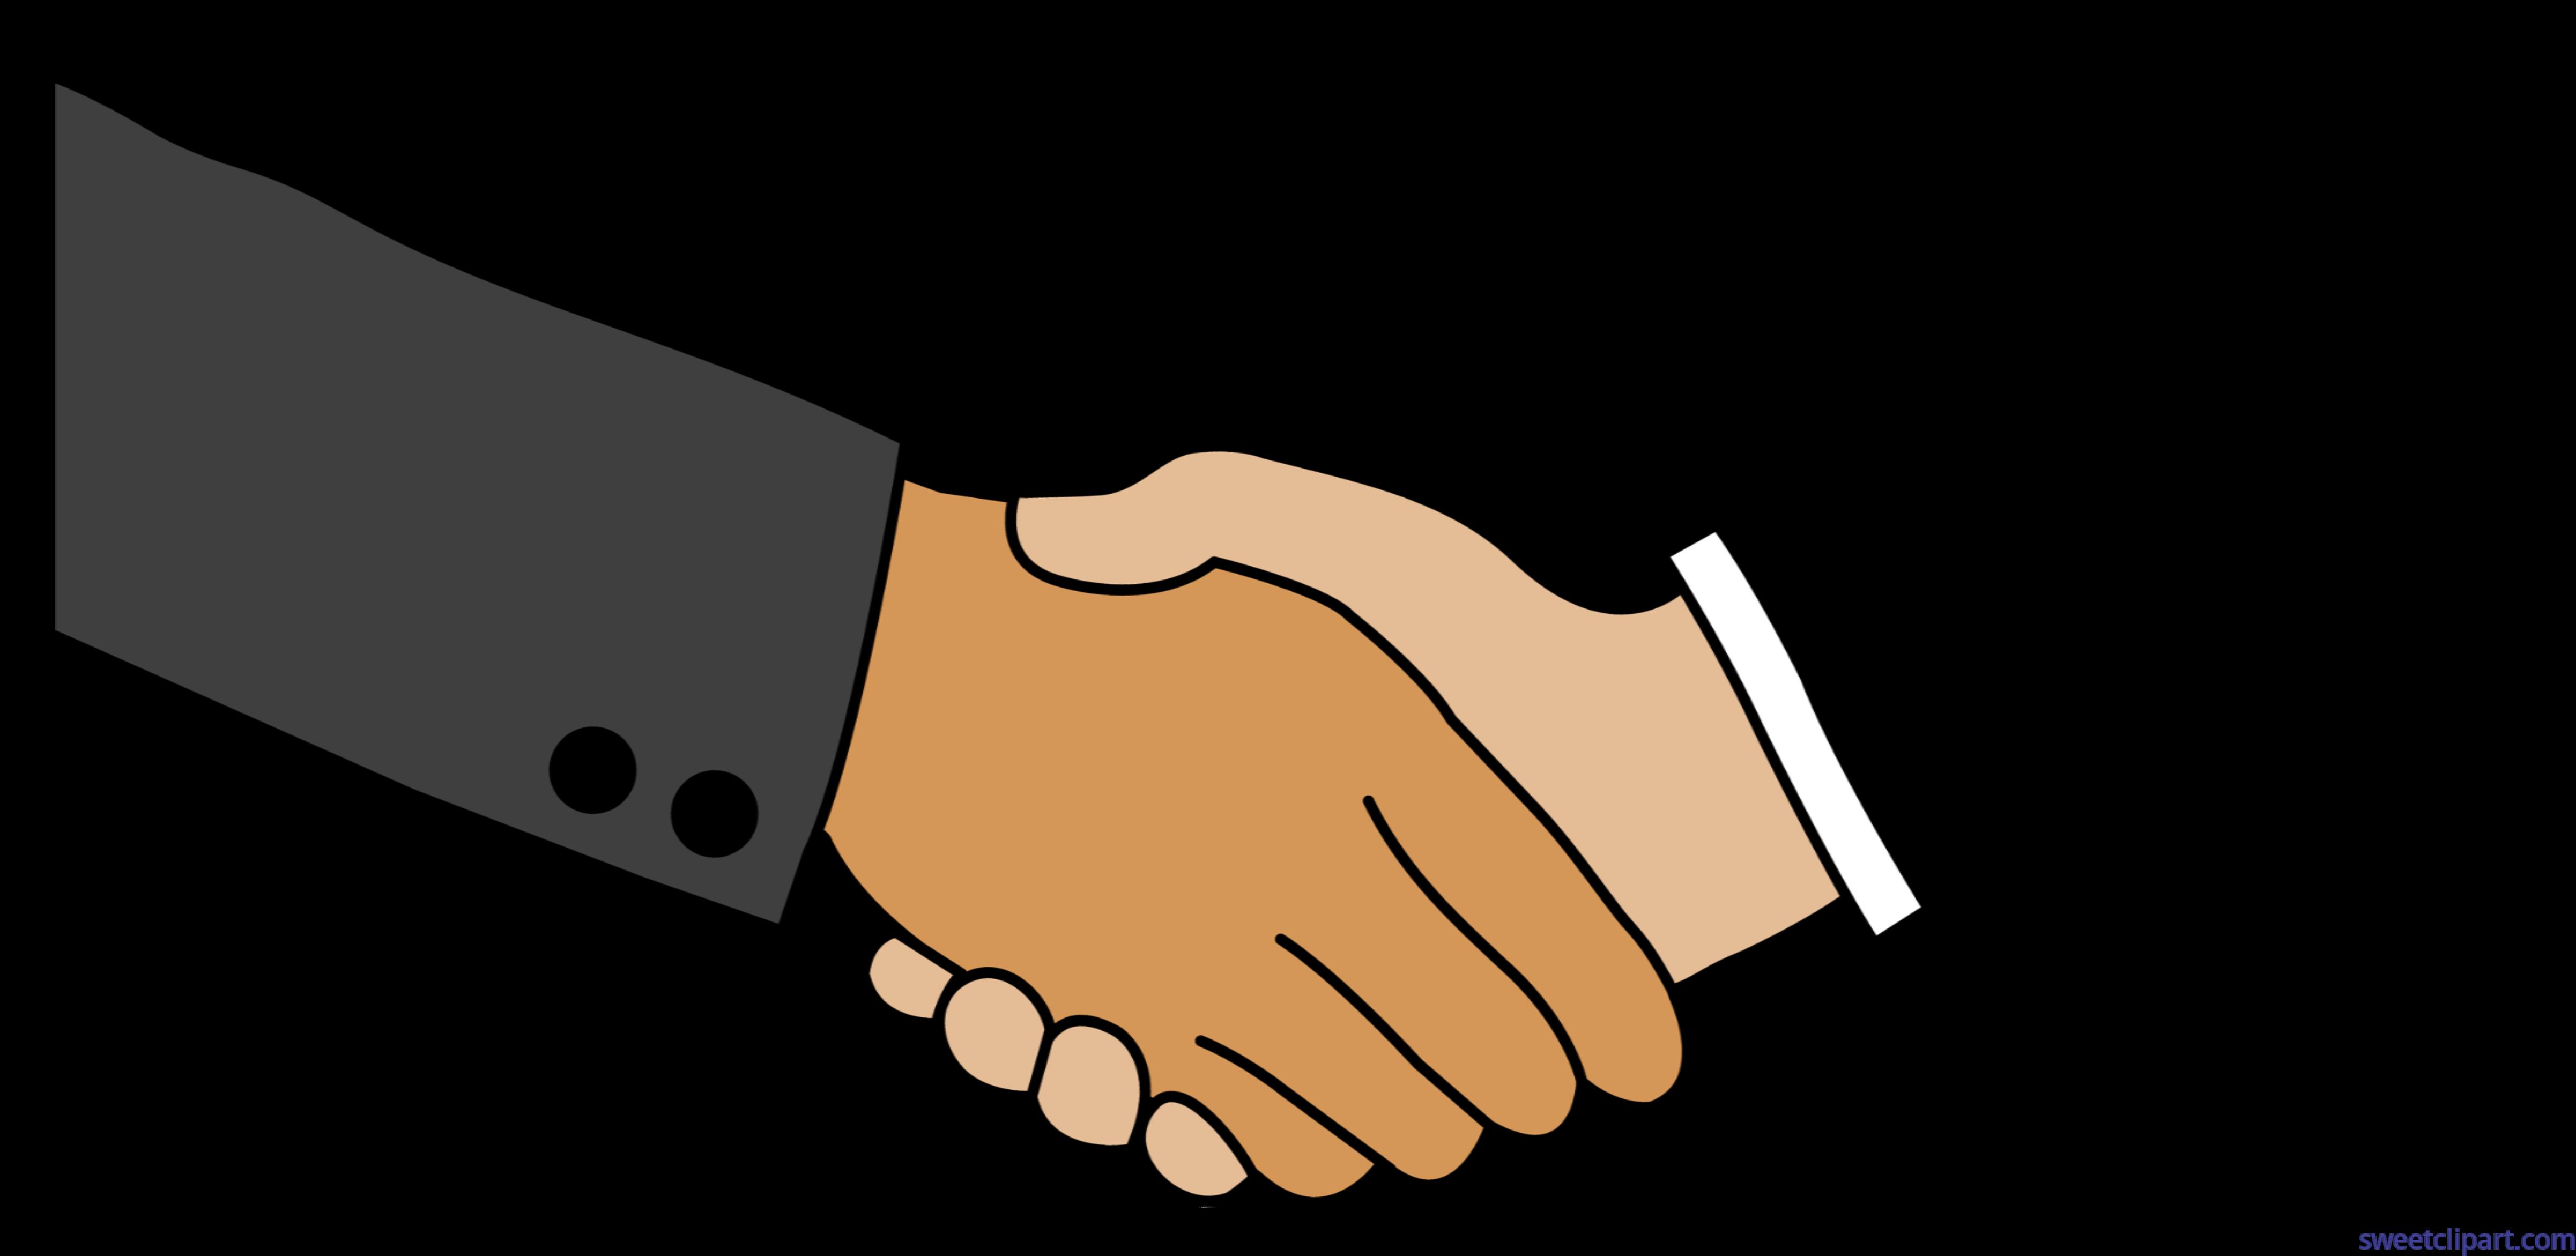 Handshake clipart drawn. Business clip art sweet